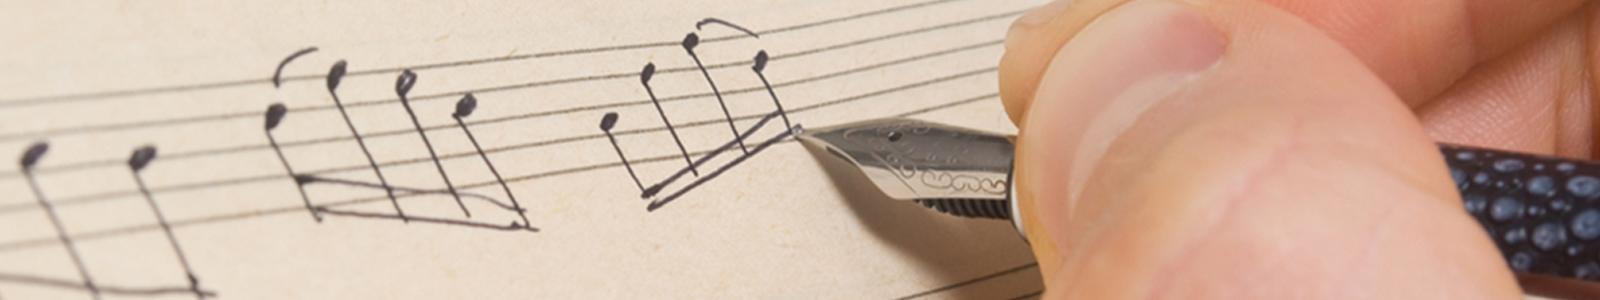 Musikteori